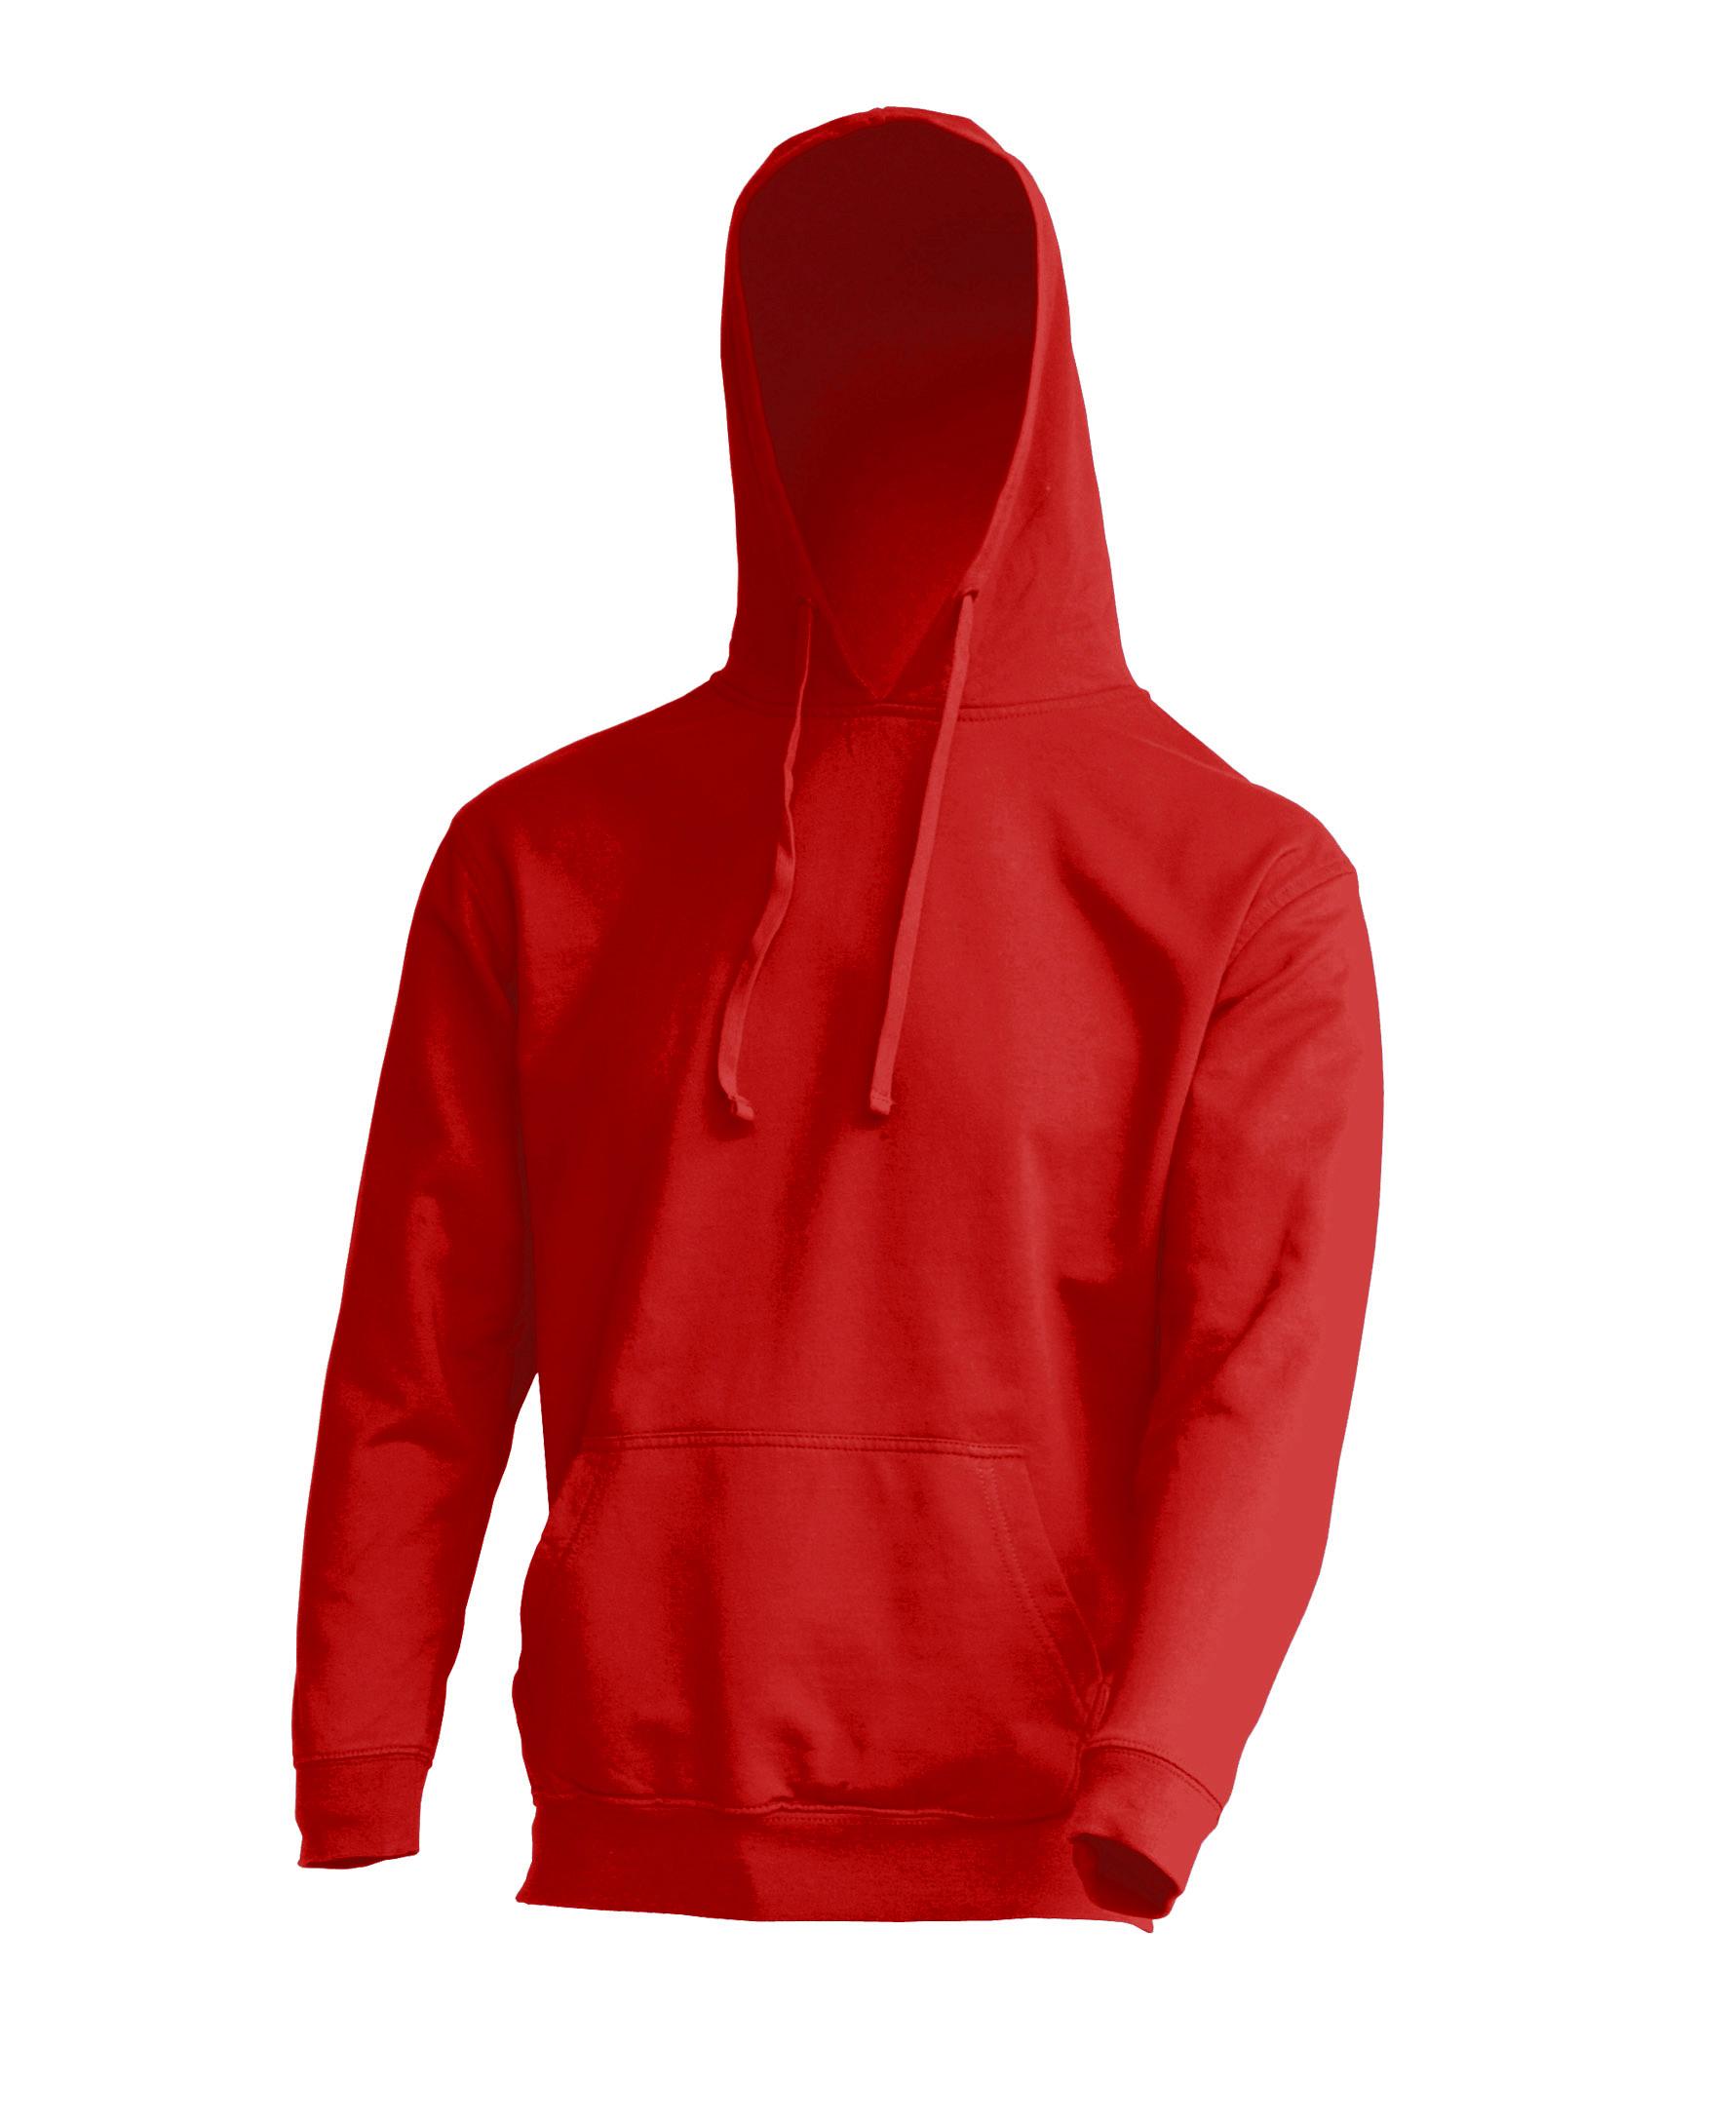 Kangaroo Sweatshirt Red